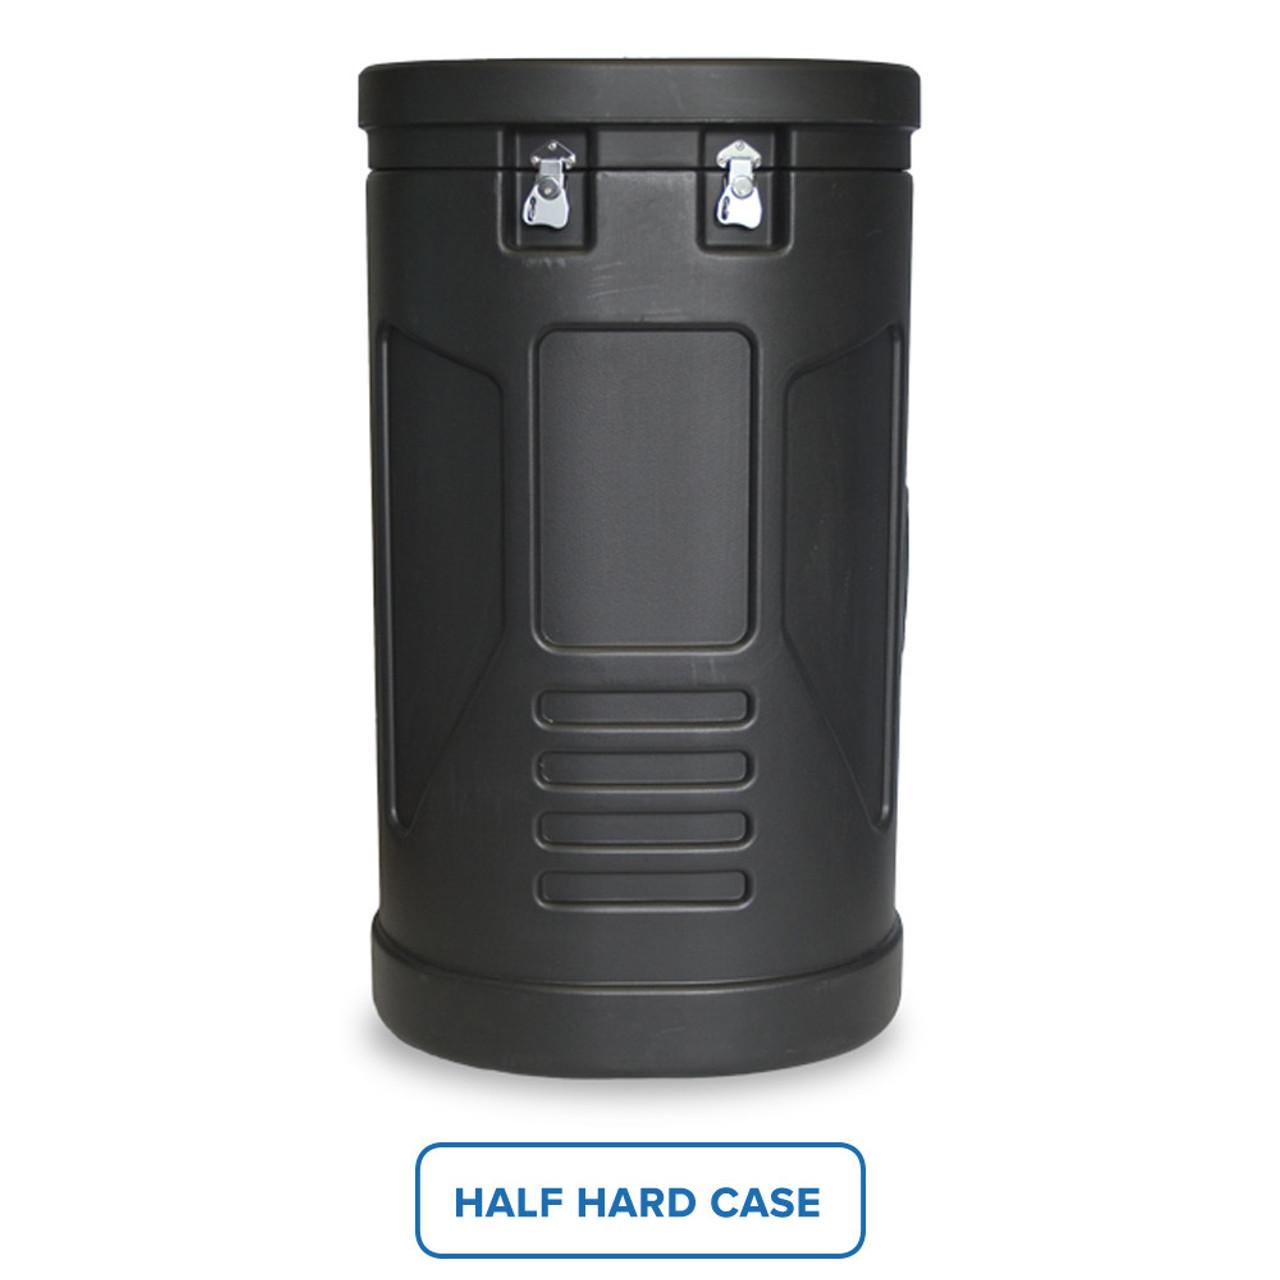 Medium Hard Case